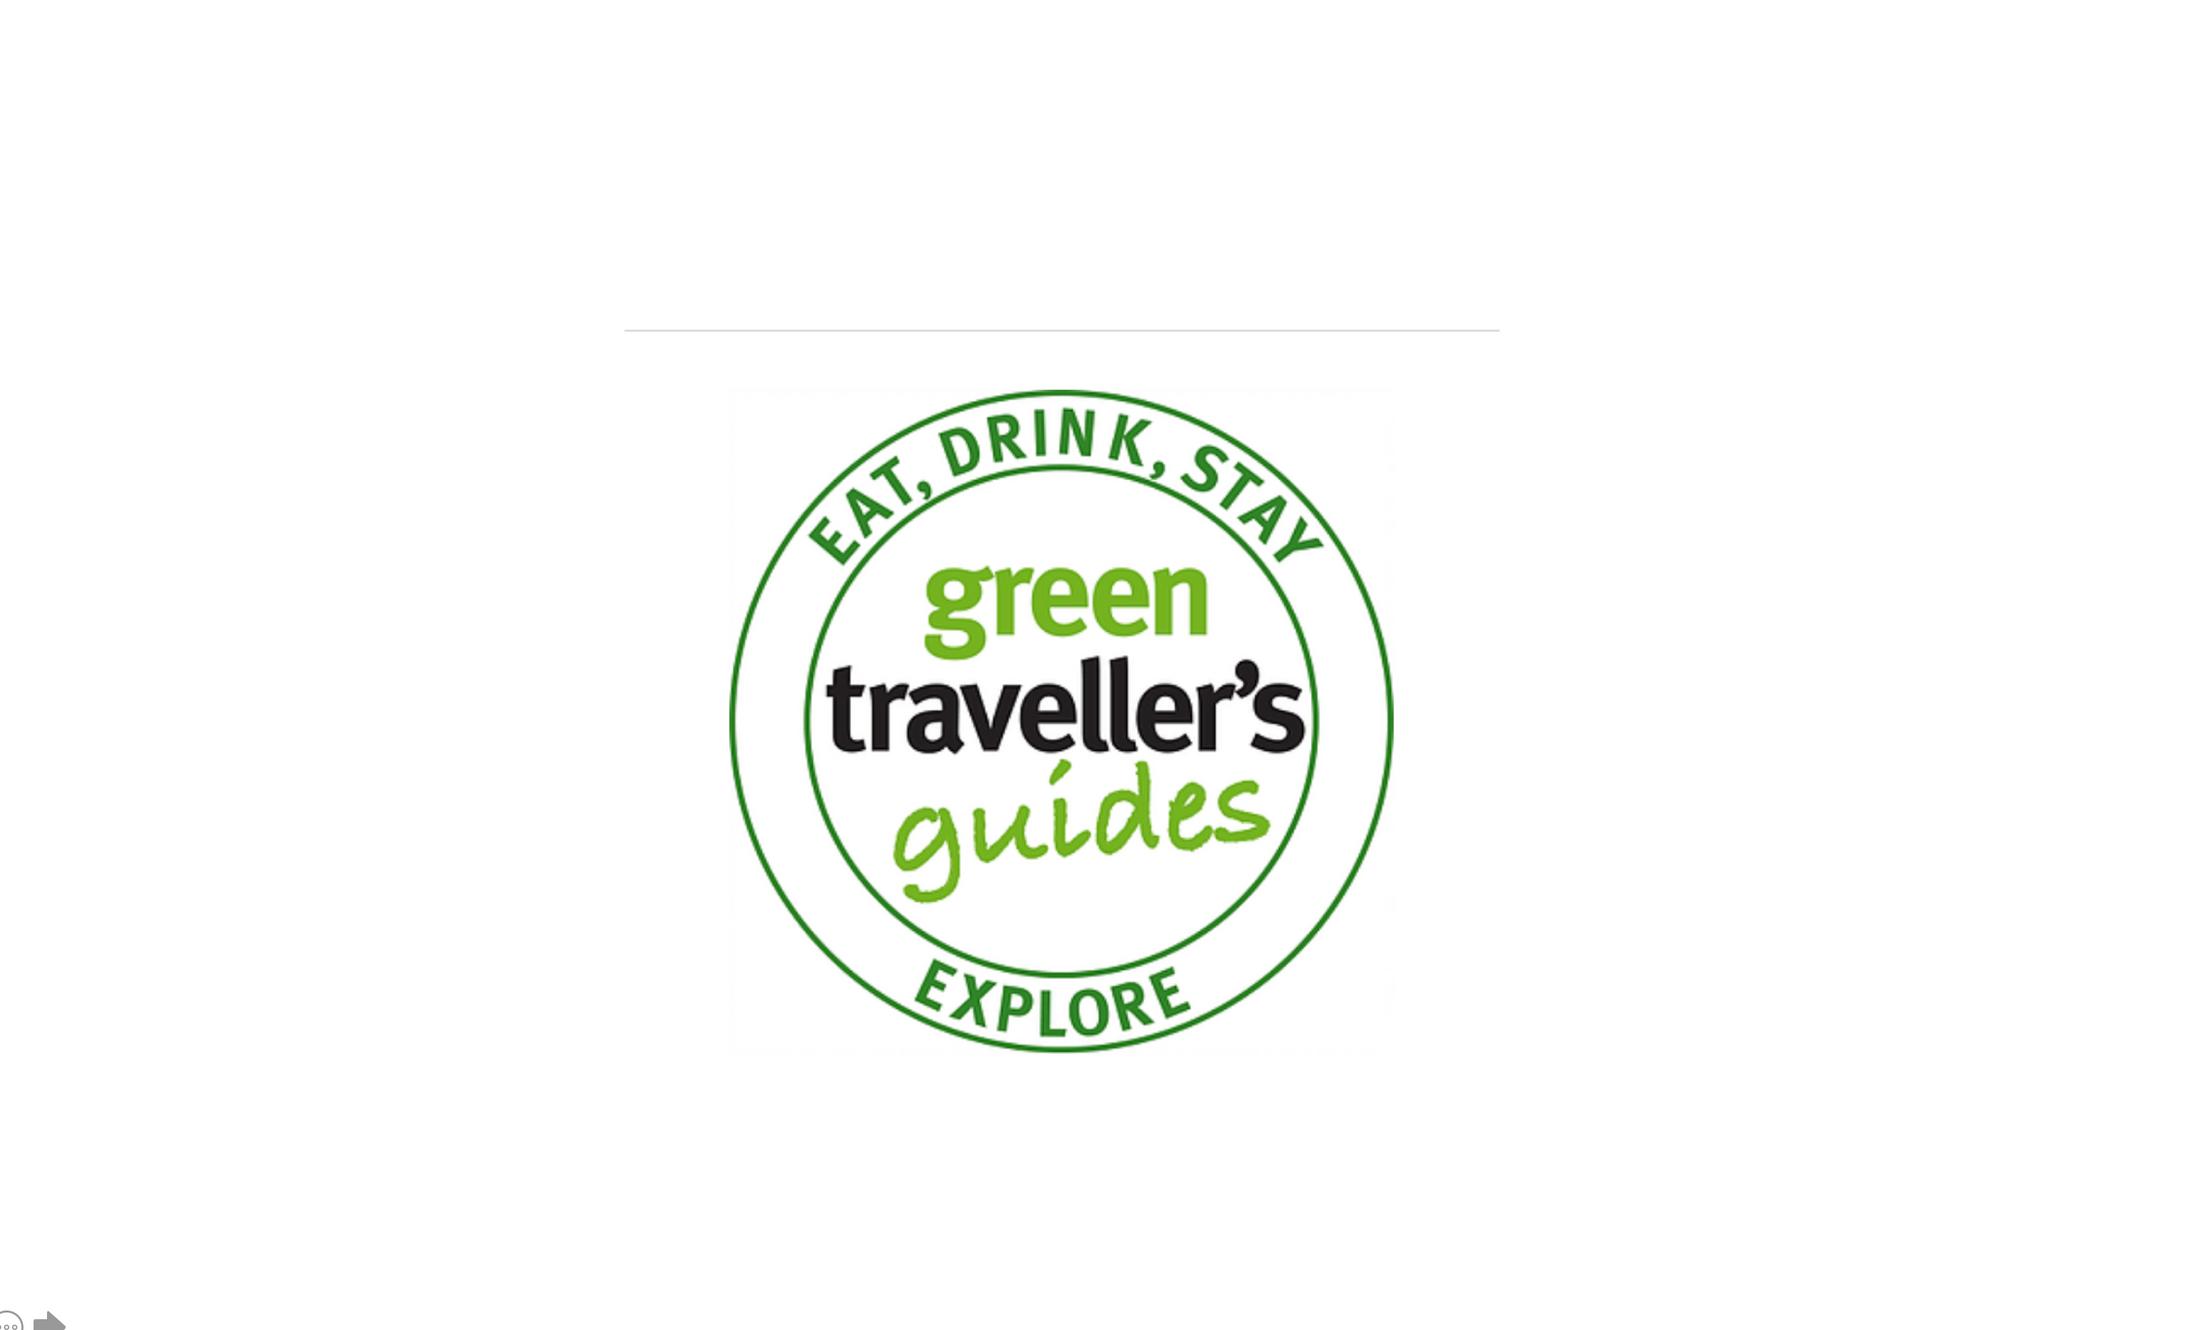 (c) Greentraveller.co.uk